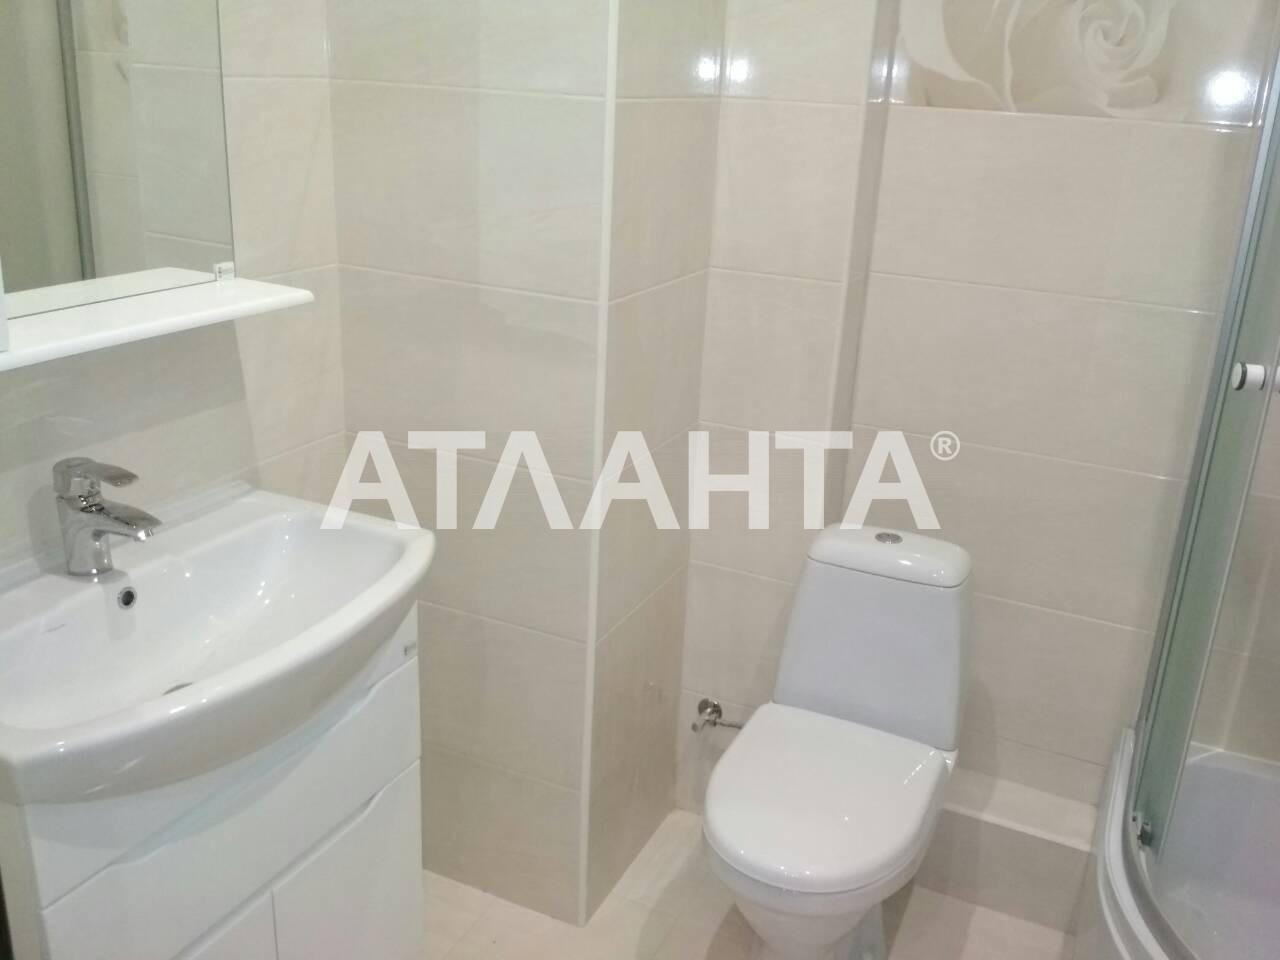 Продается 1-комнатная Квартира на ул. Радужный М-Н — 36 500 у.е. (фото №5)